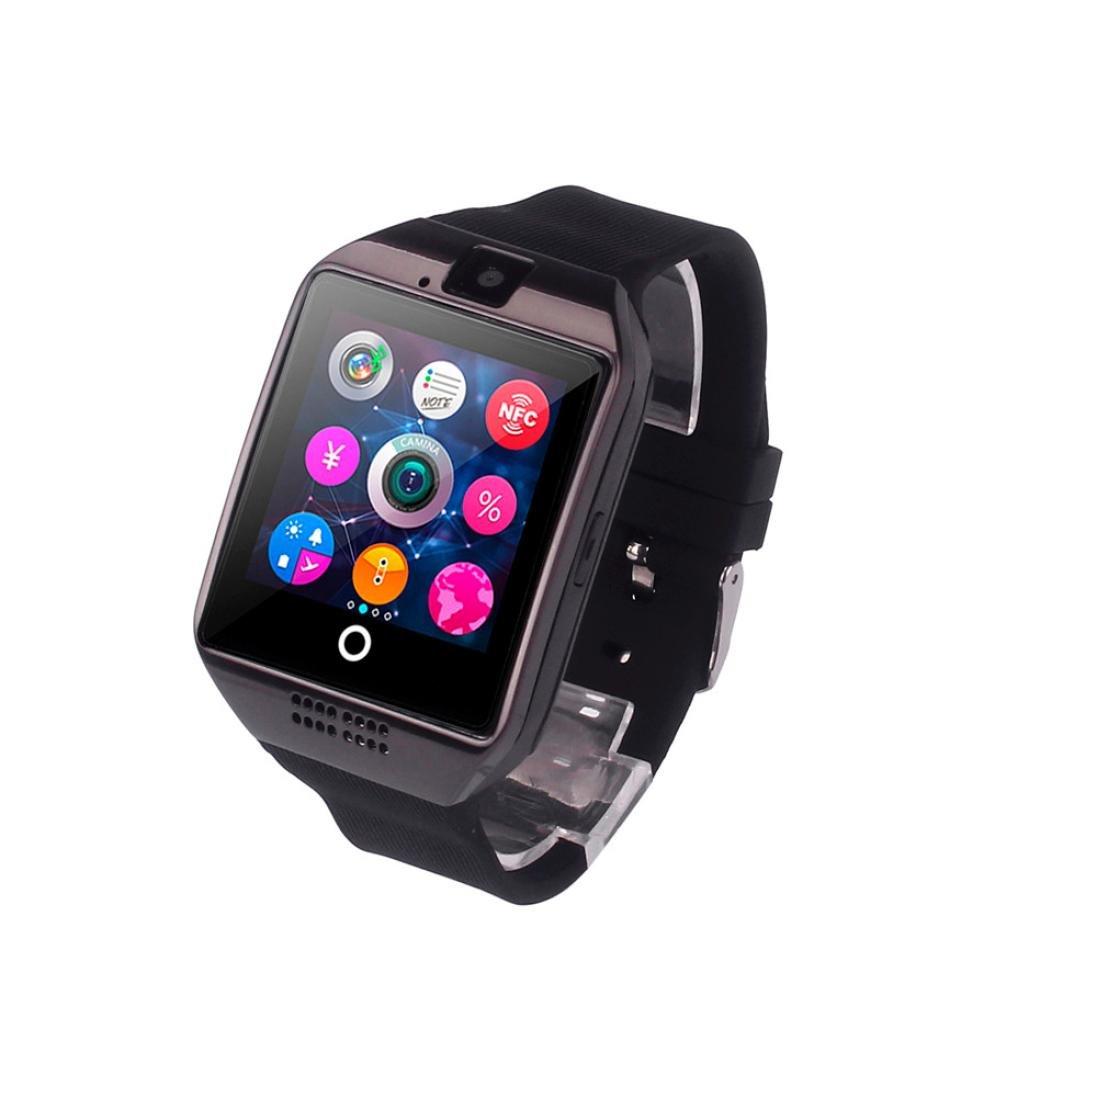 Reloj Inteligente Xinan Nuevo reloj inteligente Bluetooth Q18 Tarjeta SIM de soporte de cámara para teléfono inteligente Android (❤️Negro): Amazon.es: ...